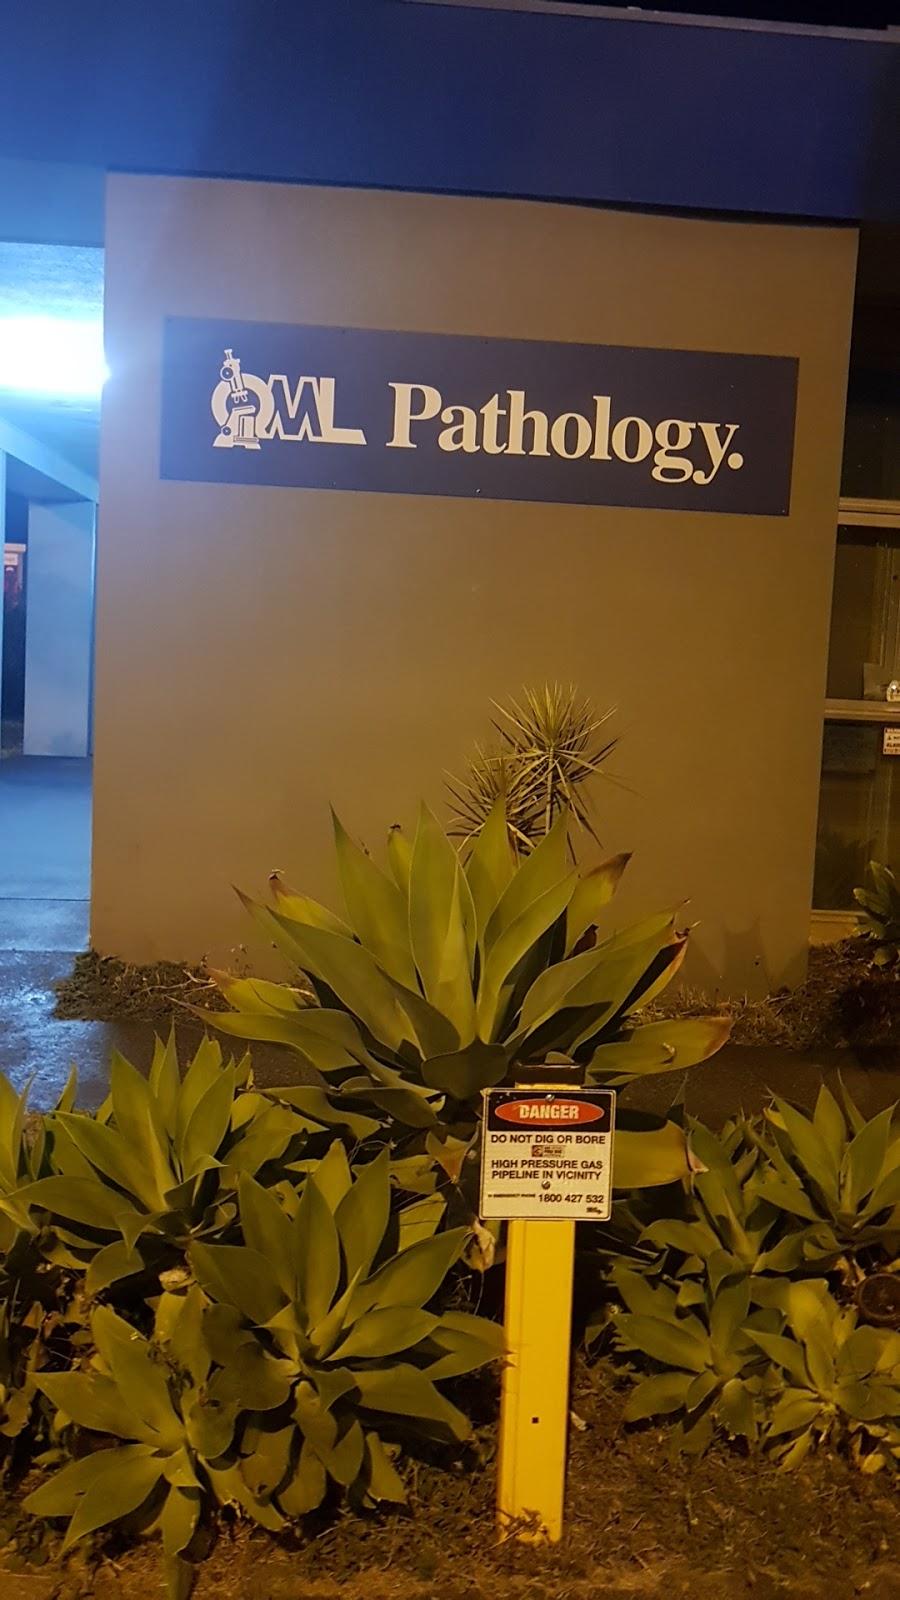 QML Pathology | doctor | Shauna Downs S/C, Cnr Beenleigh Rd & Wynne St, Sunnybank Hills, QLD, 4109, Sunnybank Hills QLD 4109, Australia | 0733458787 OR +61 7 3345 8787